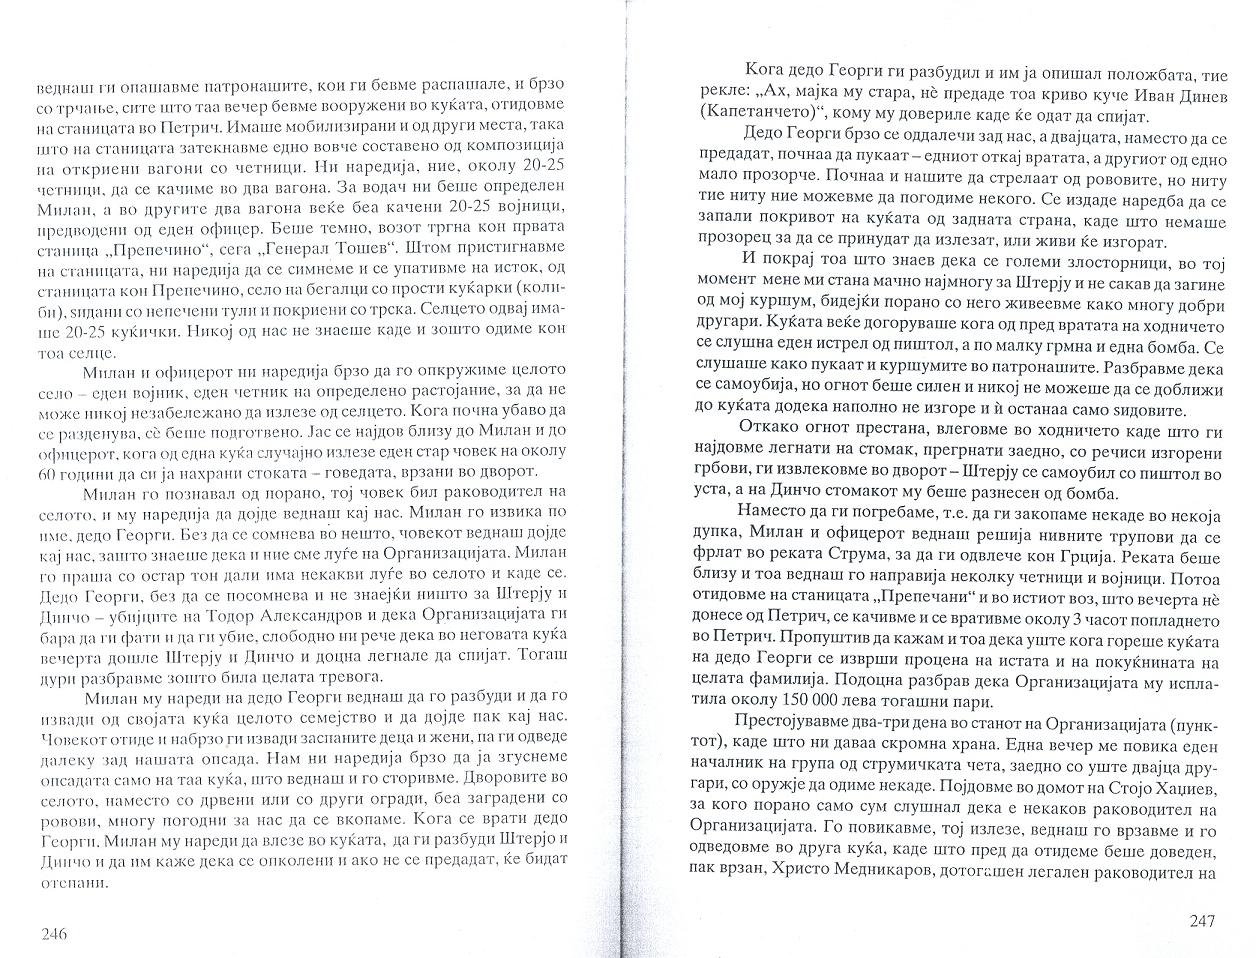 [scan0018.jpg]